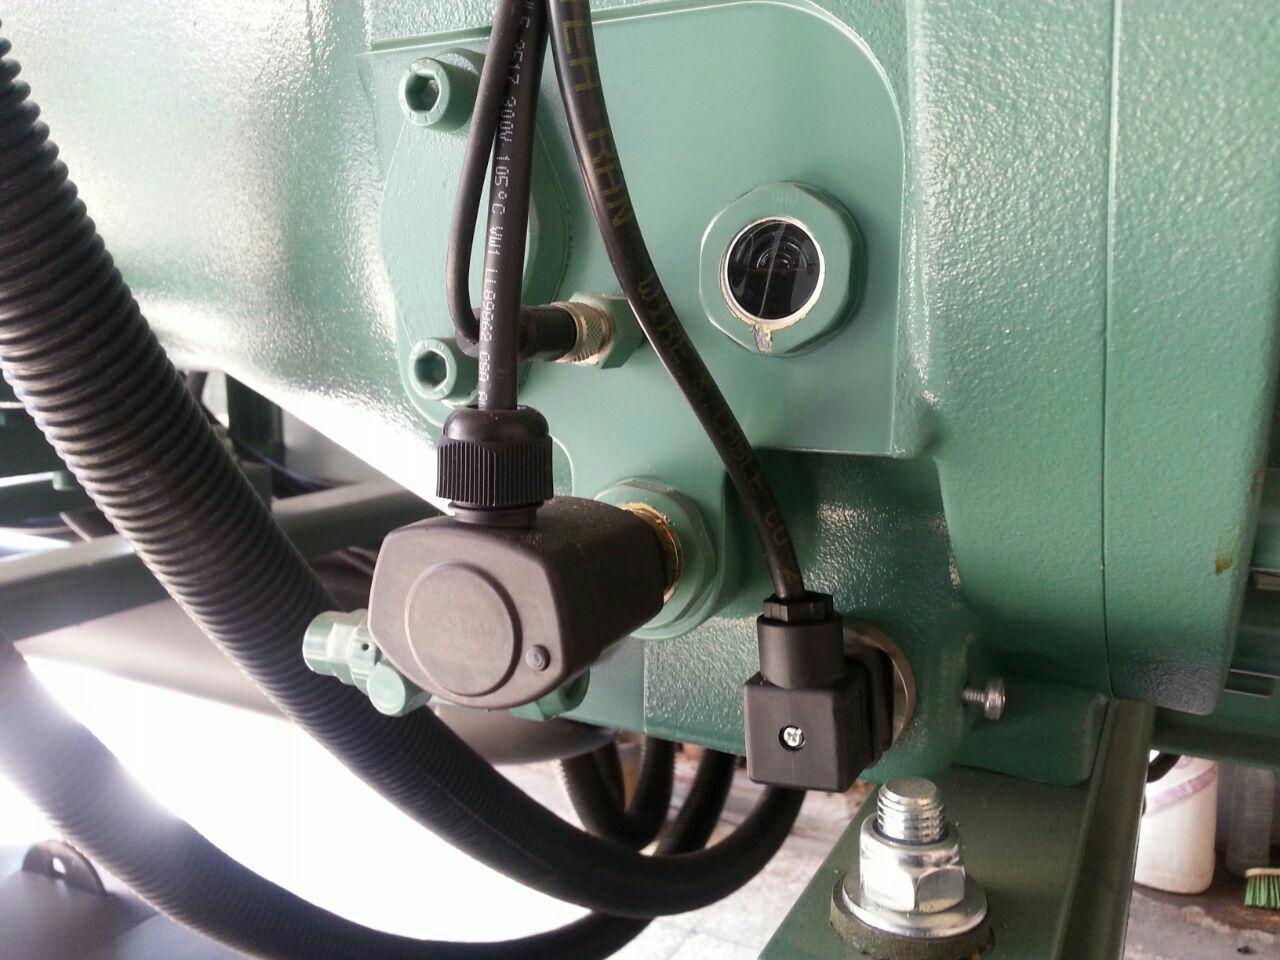 کنترل سطح روغن کمپرسور اسکرو